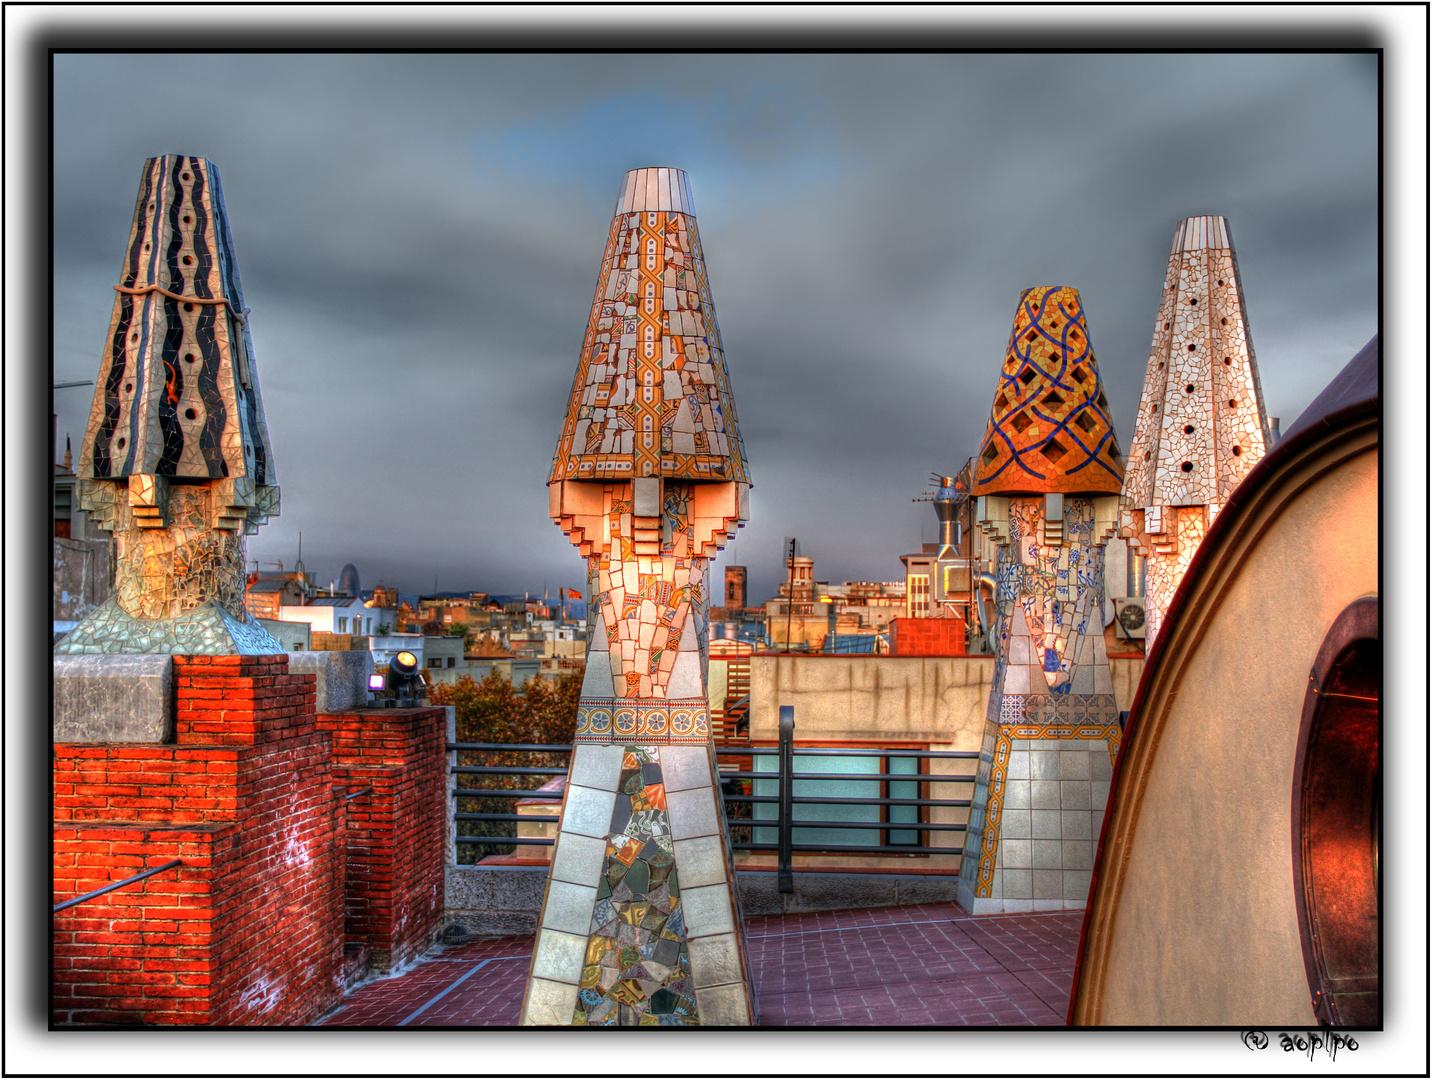 Chimeneas de Gaudi (2)